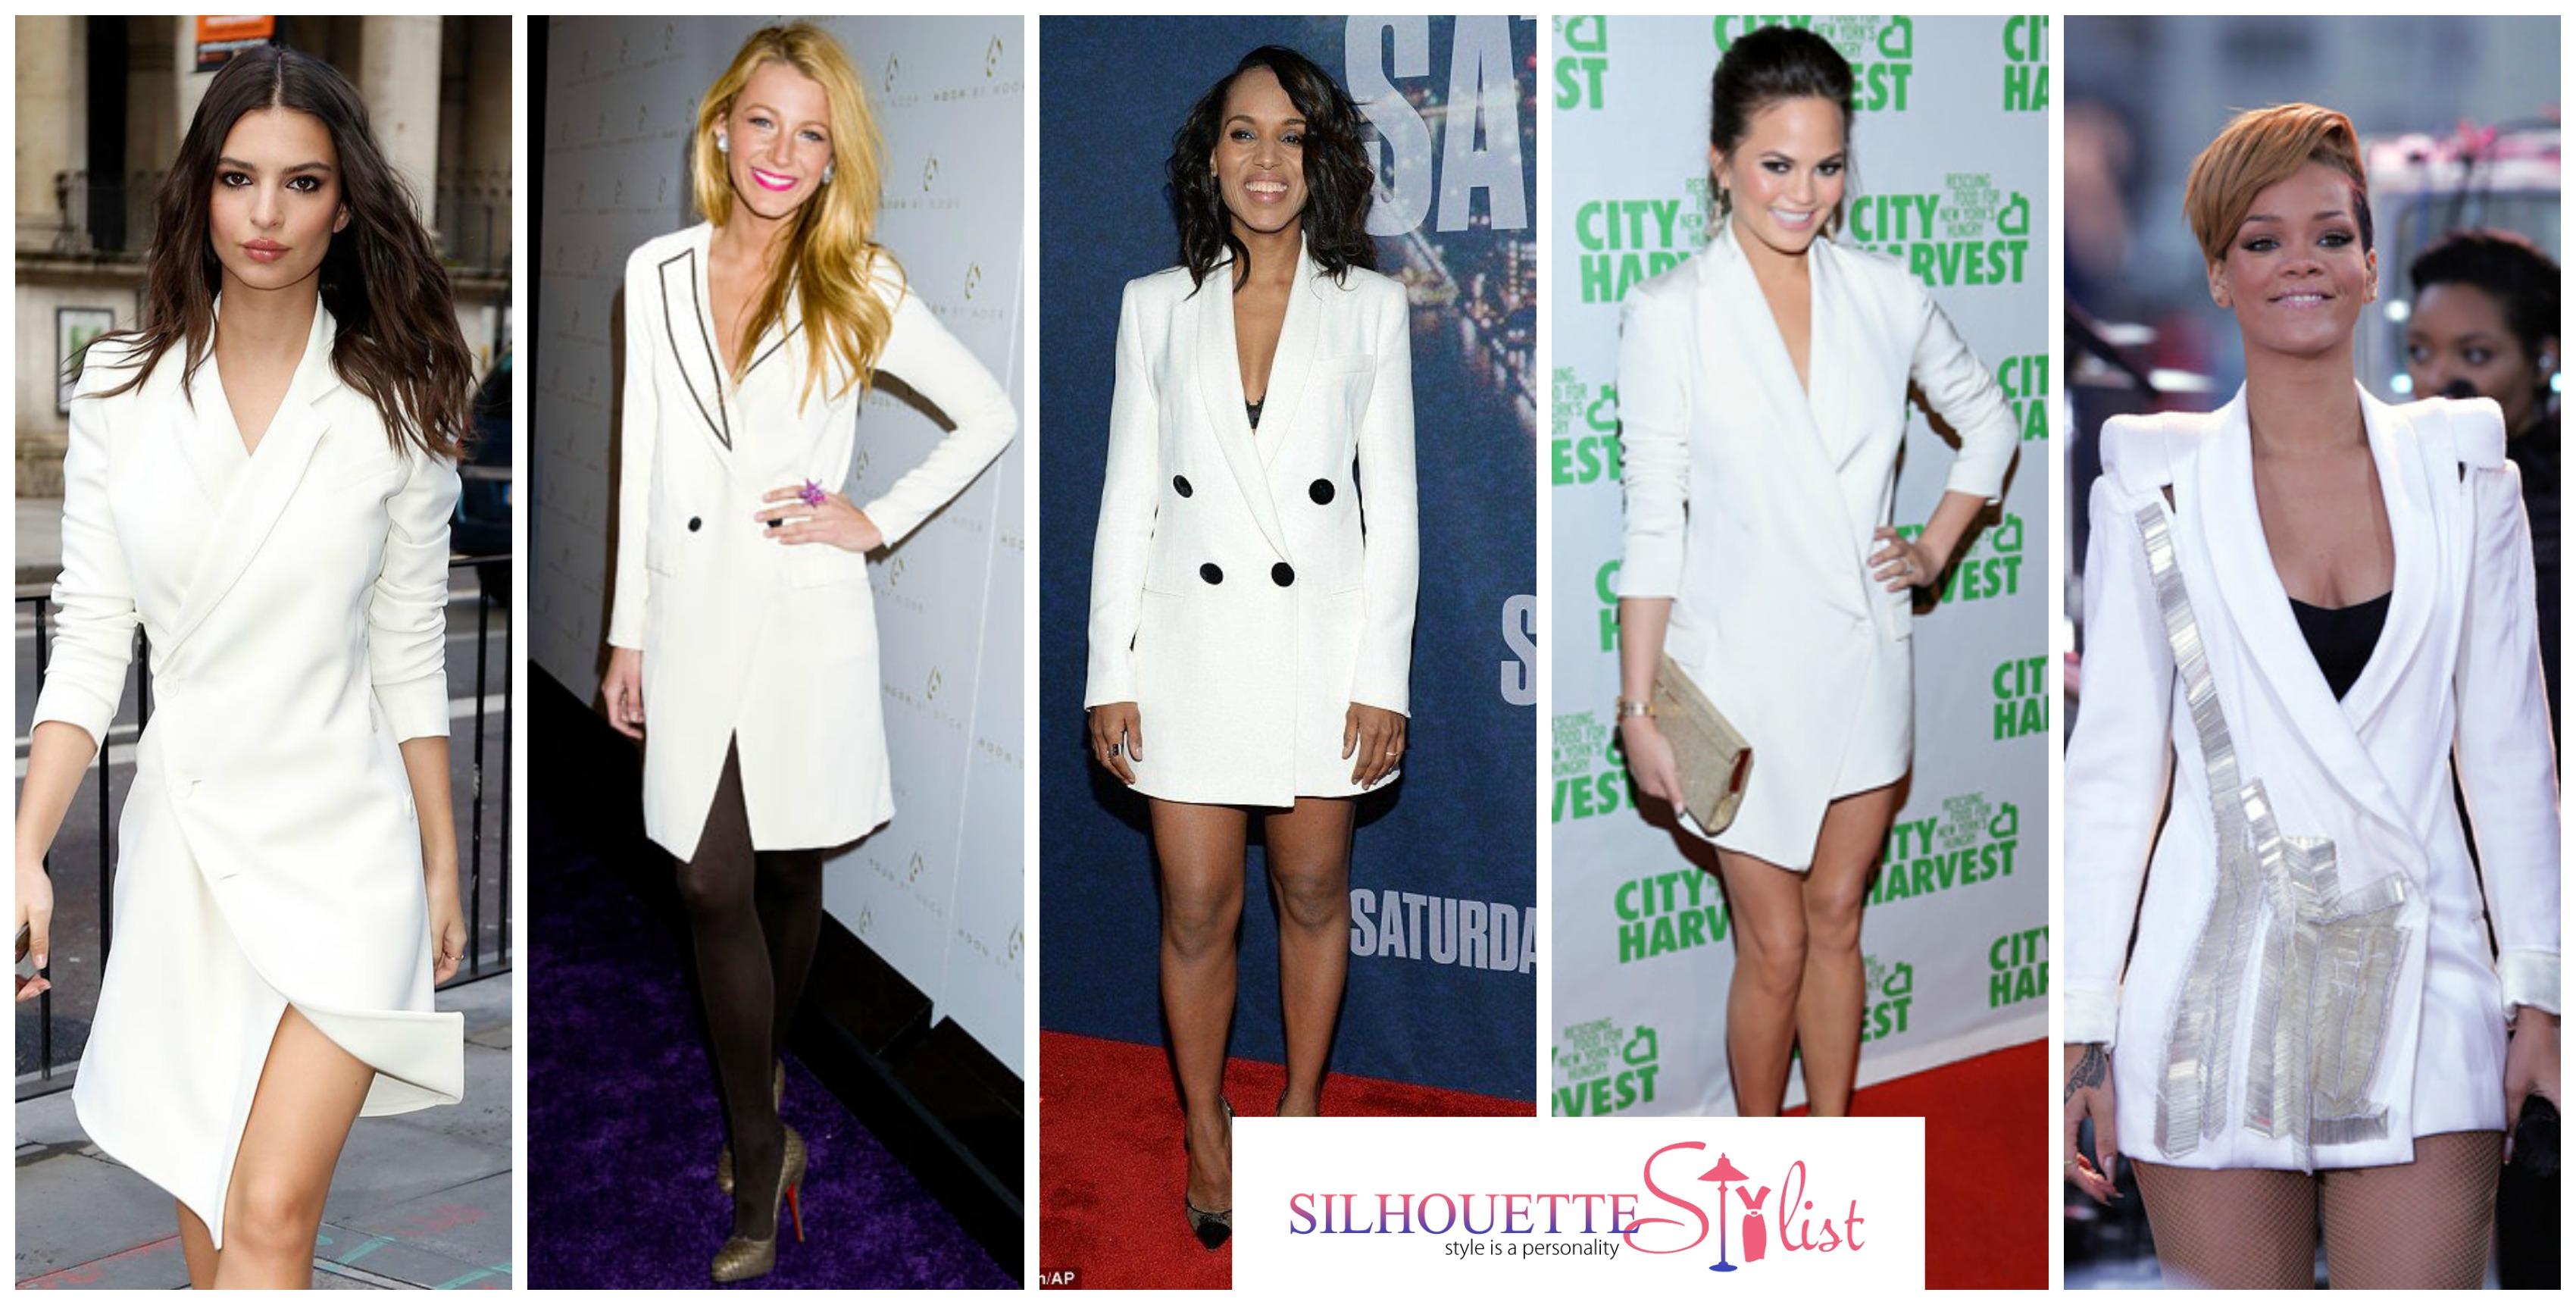 f5ad2a718ab3 Blazer Dress - Emily Ratajkowski, Blake Lively, Kerry Washington, Chrisy  Teigen, Rihanna